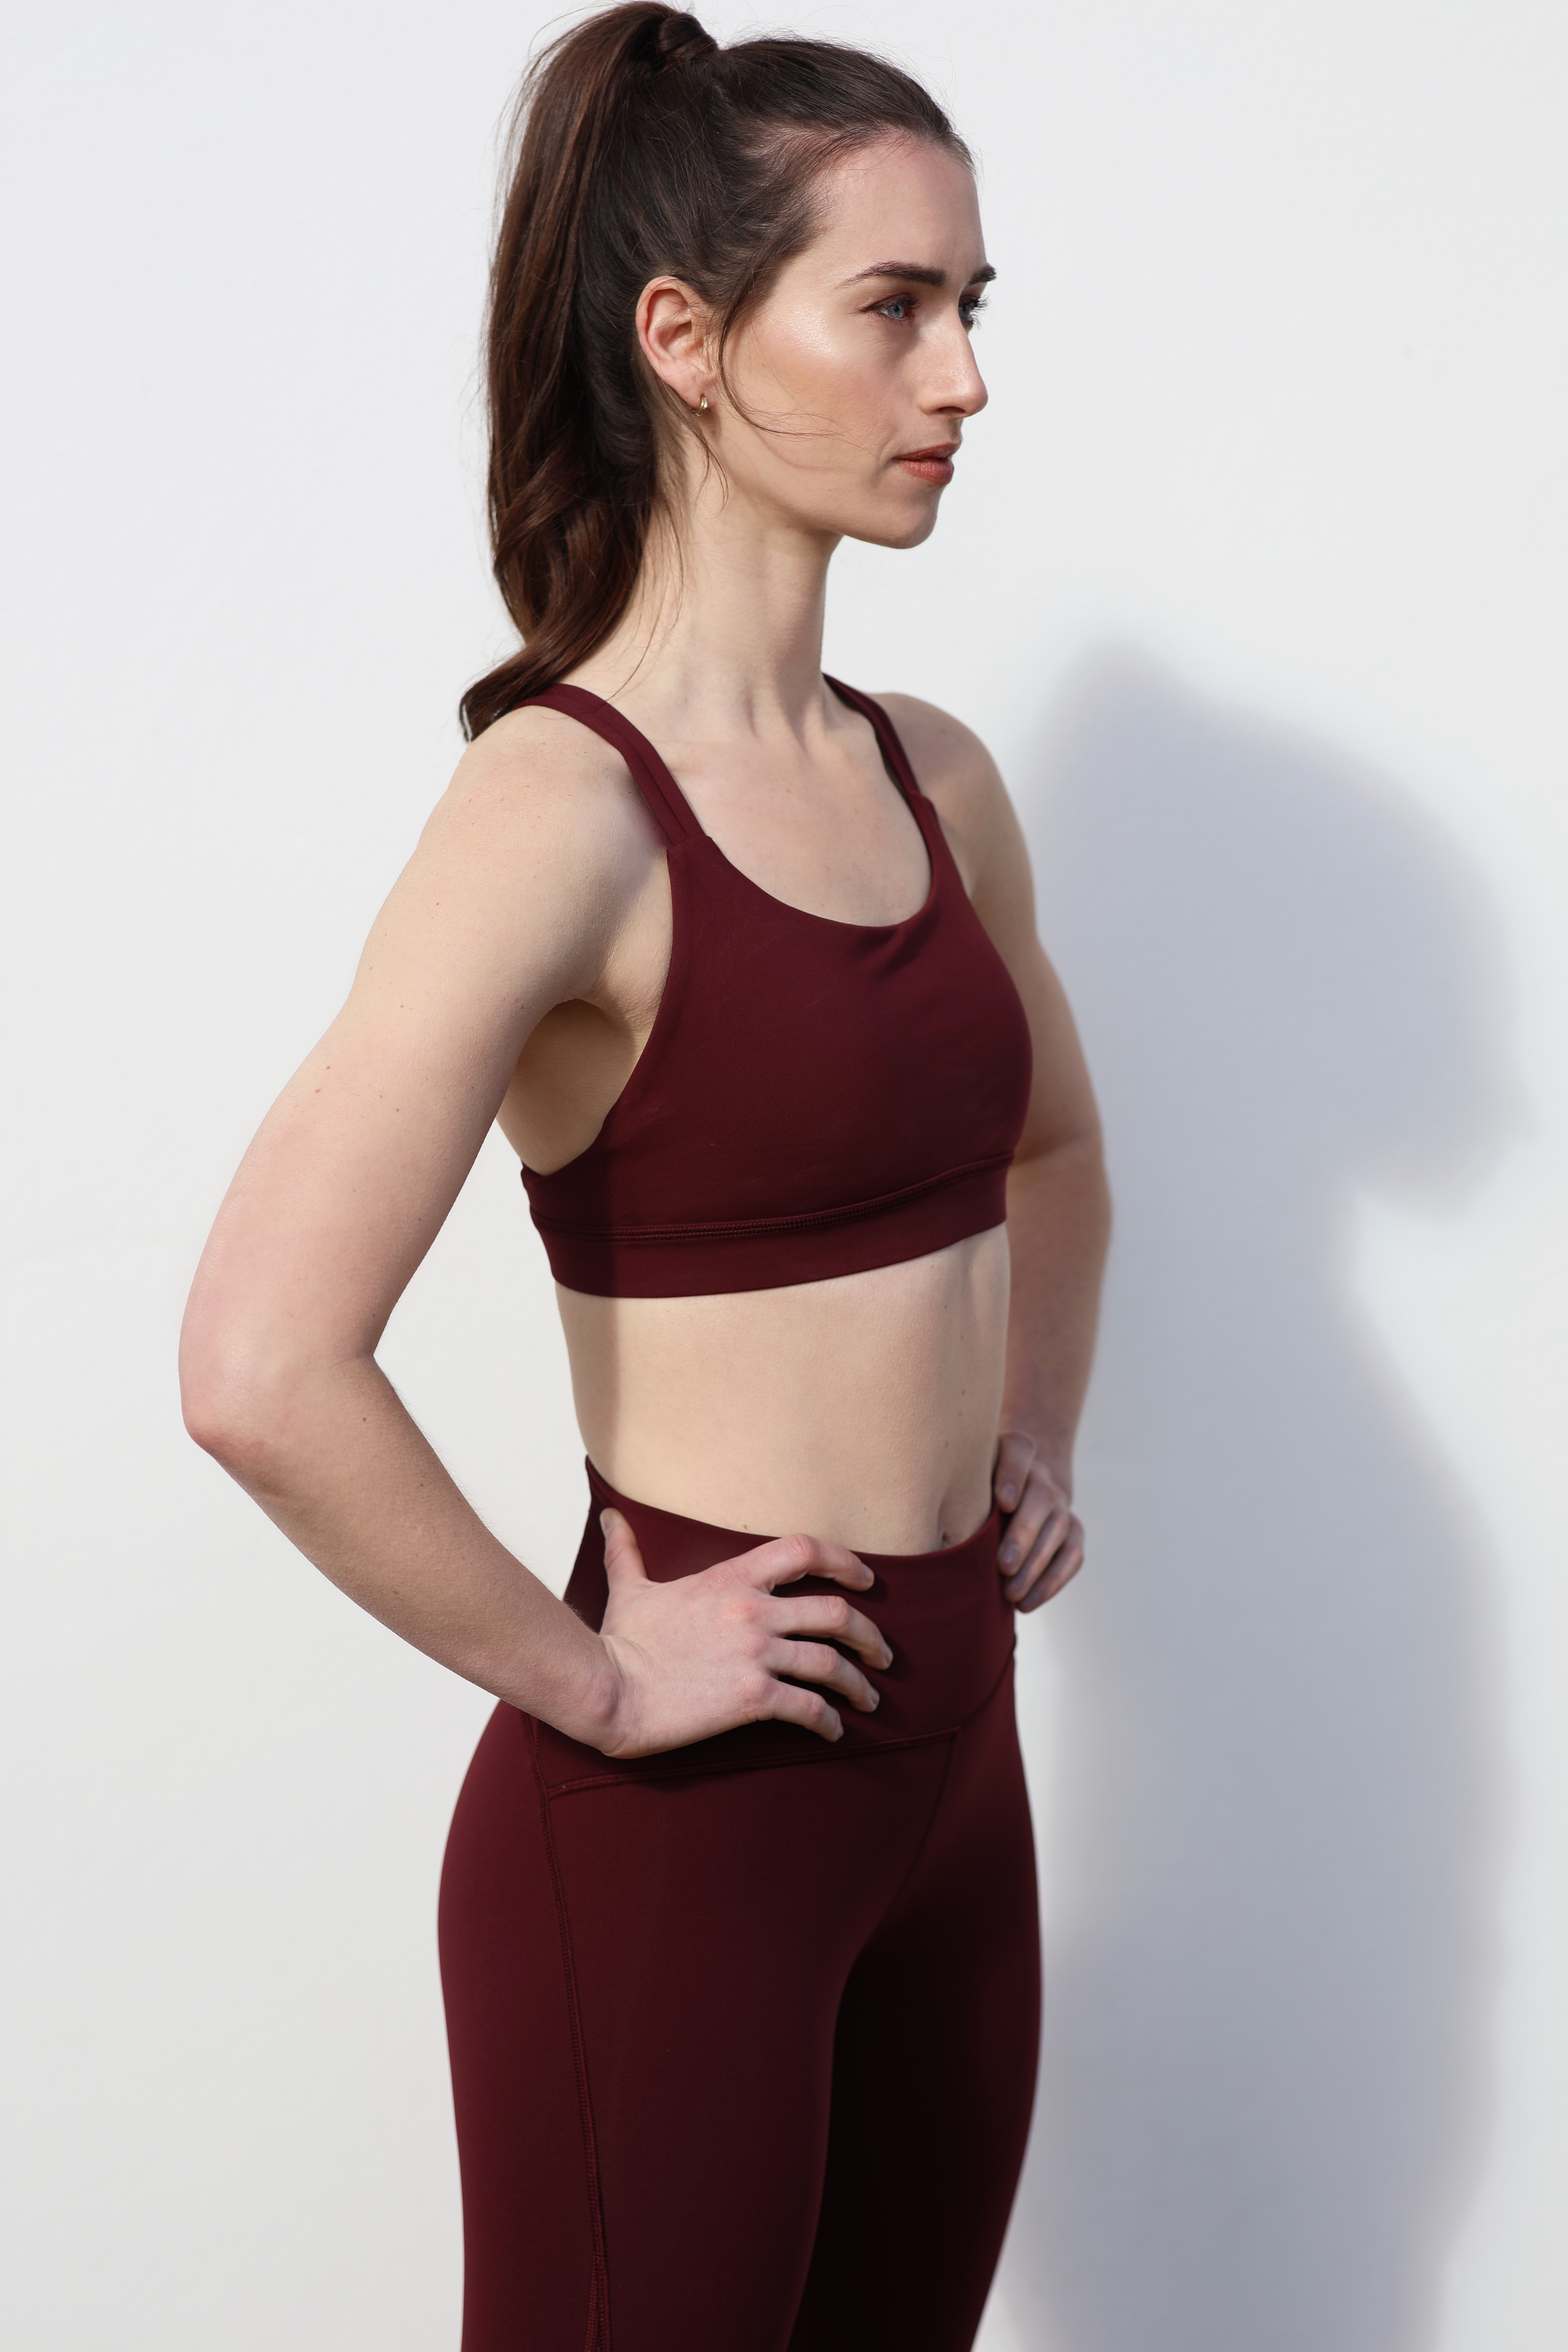 Shine-Female-Model-Laura-London-Fitness-Fashion-04.jpg#asset:51550